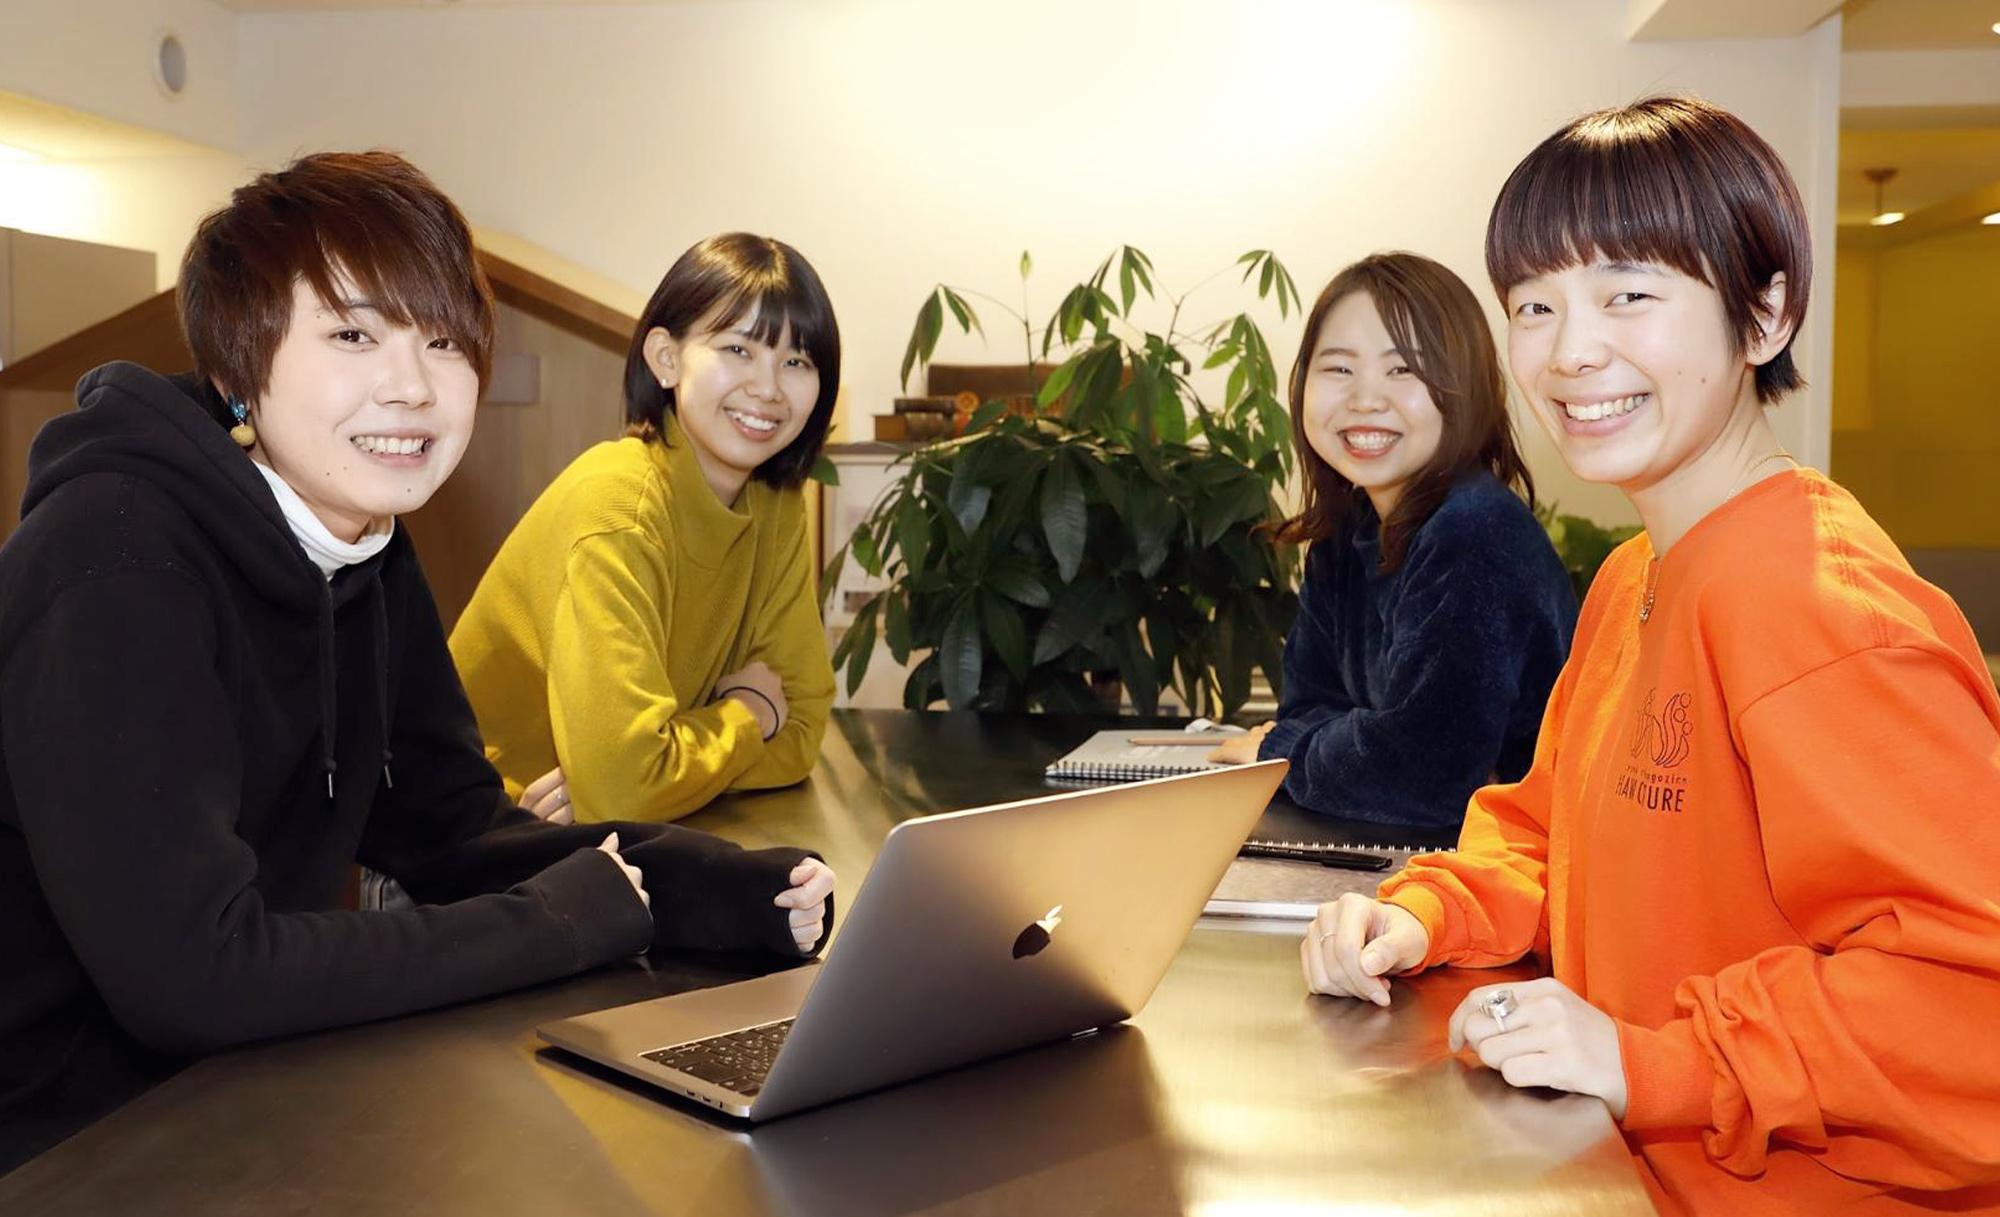 ホンネ座談会 02 新卒社員2019編